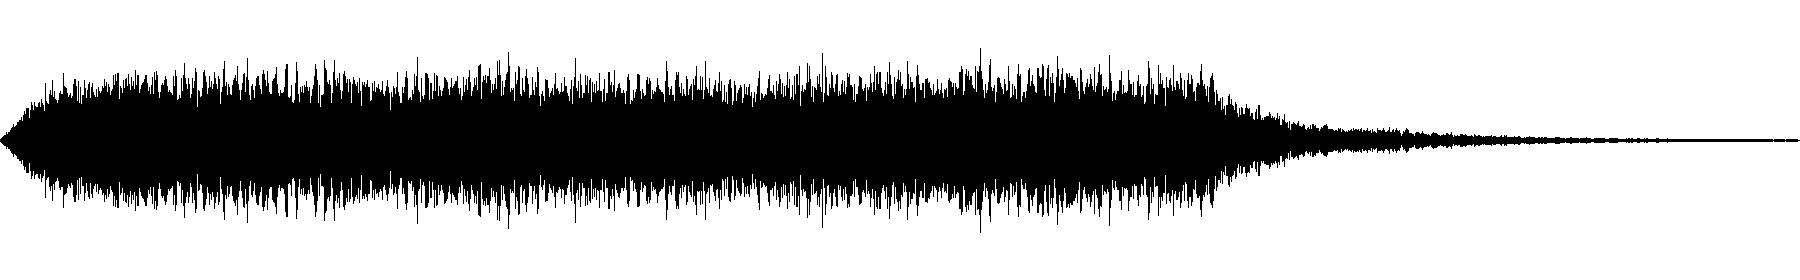 organ c6